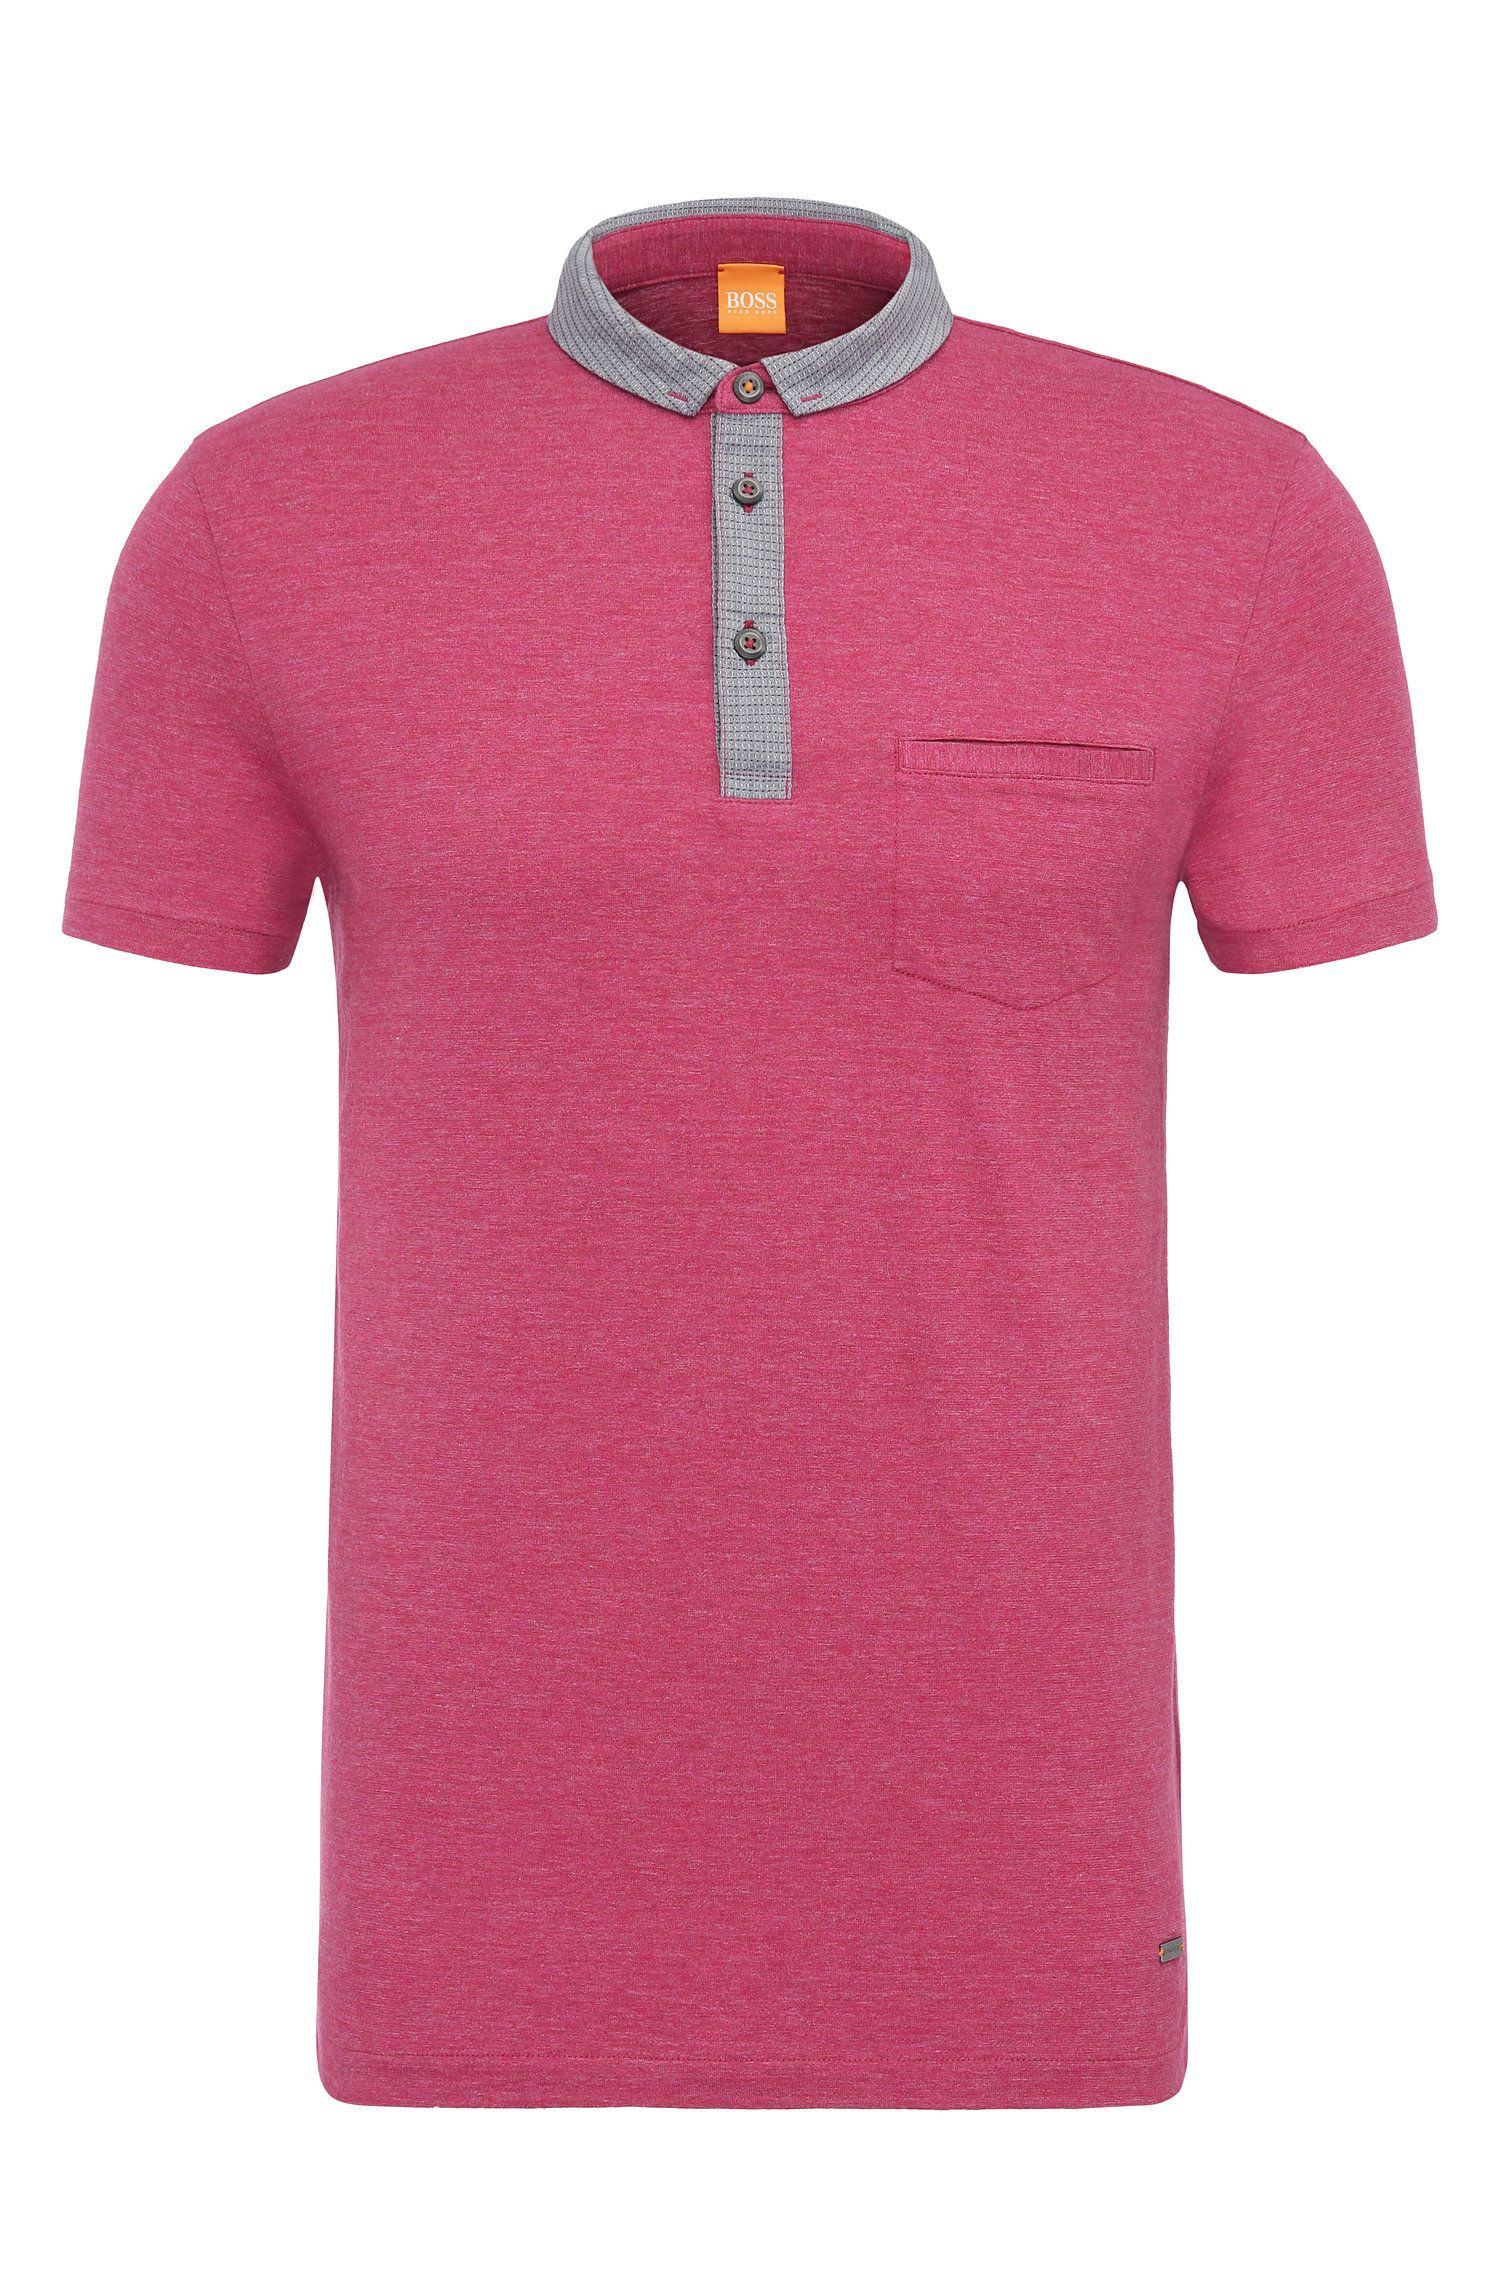 'Patcherman 1'   Regular Fit, Marled Cotton Polo Shirt